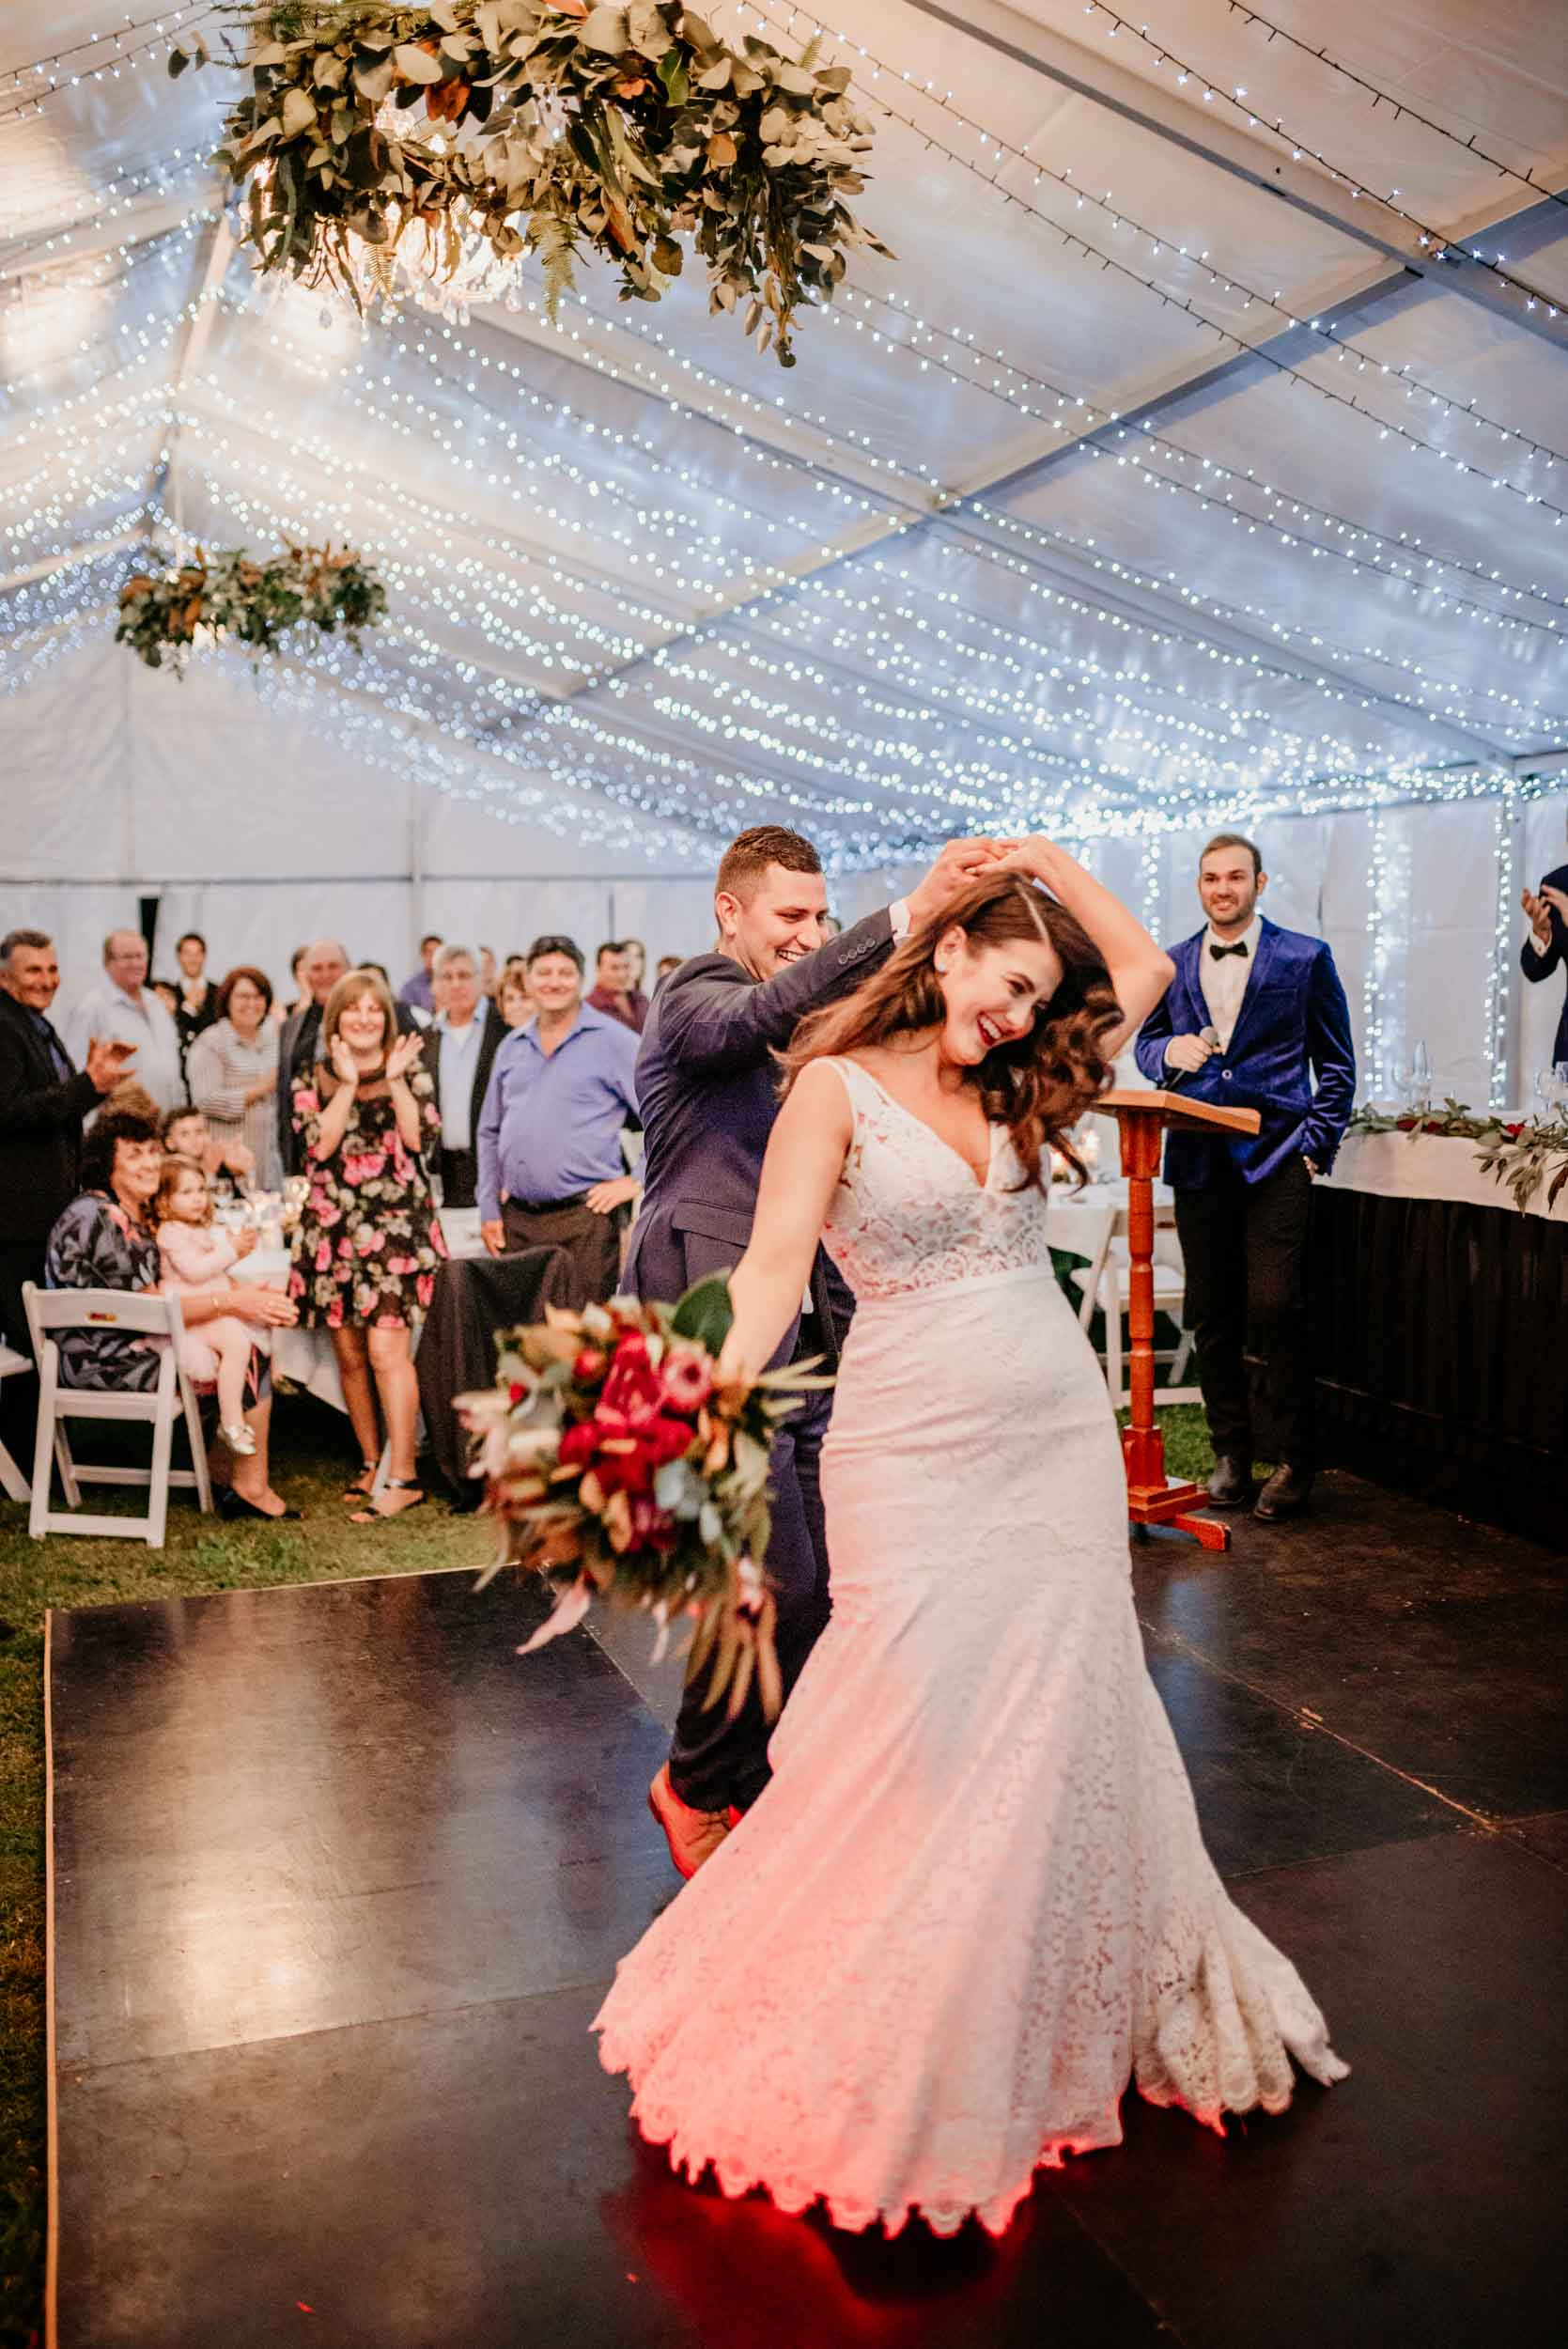 The Raw Photographer - Cairns Wedding Photographer - Atherton Tablelands - Mareeba farm Wedding - Irene Costa's Devine Bridal - Candid - Photo Package-53.jpg